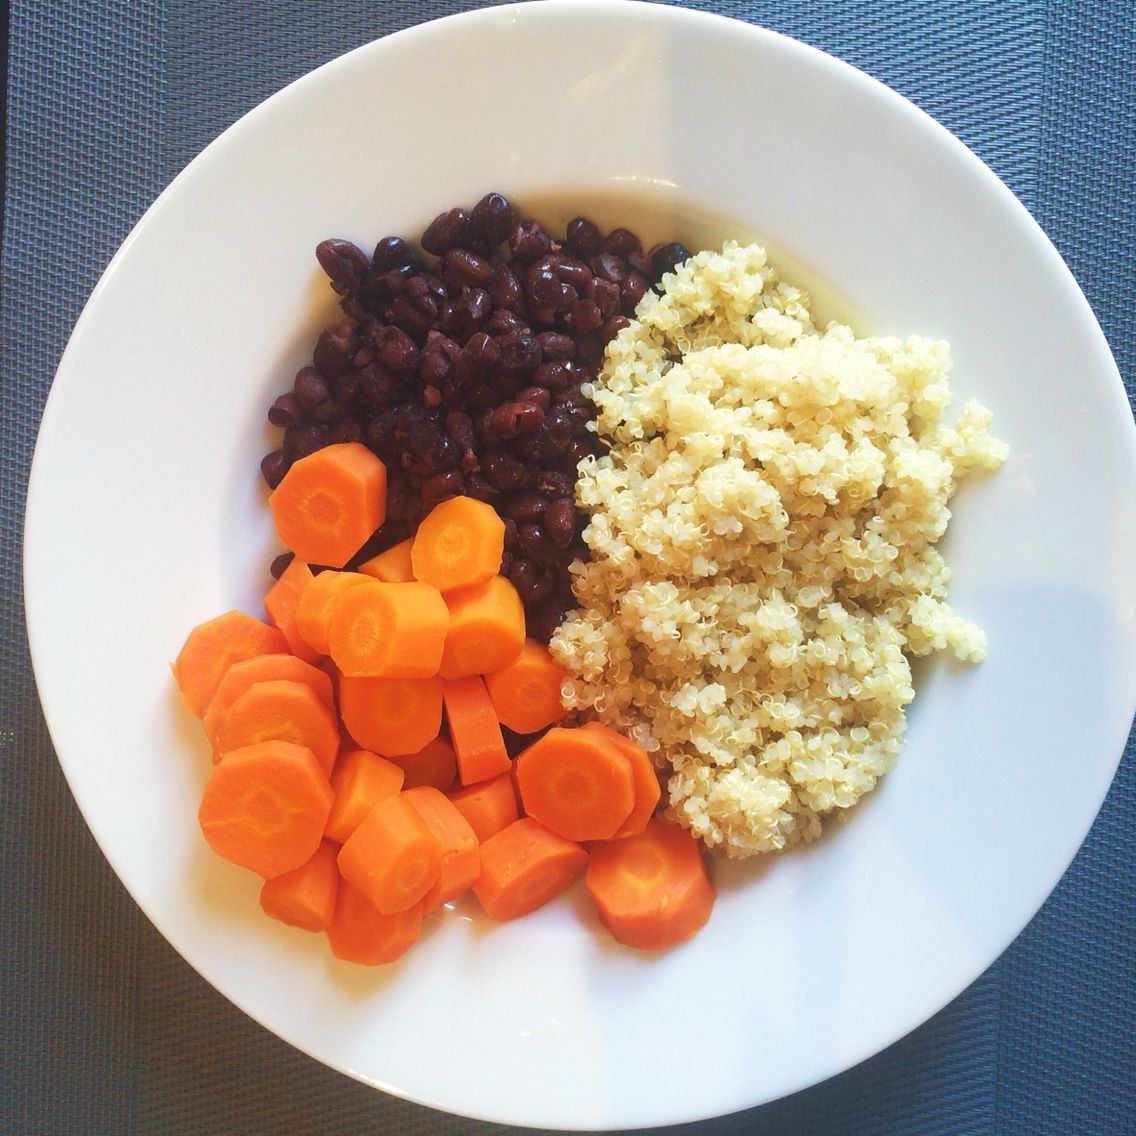 Quinoa, azukis y zanahoria. Plato vegetariano vegano.